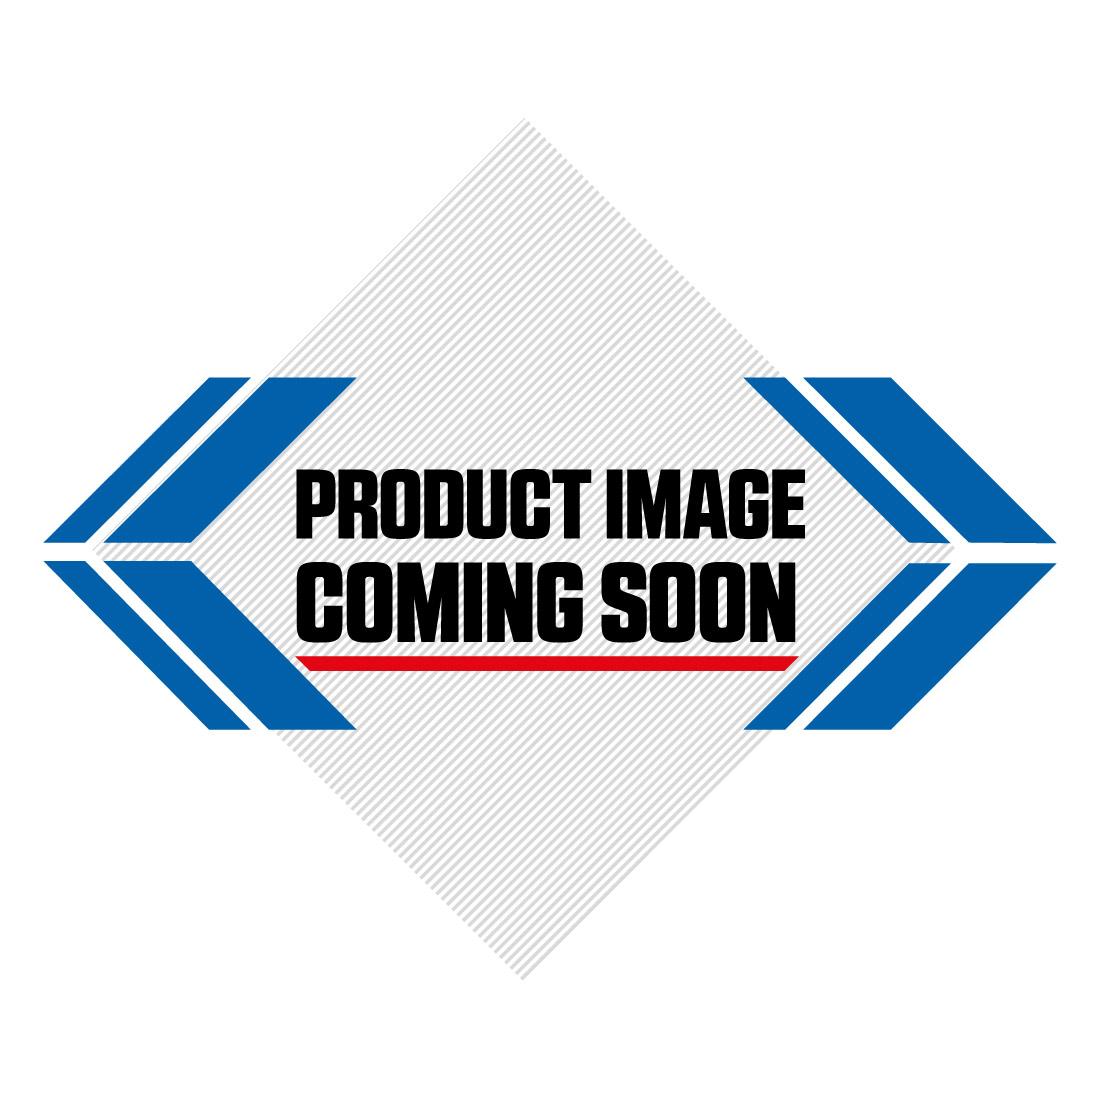 Renthal Twinring Rear Sprocket KTM SX SX-F EXC EXC-F Husqvarna TC FC TE FE - Black Image-0